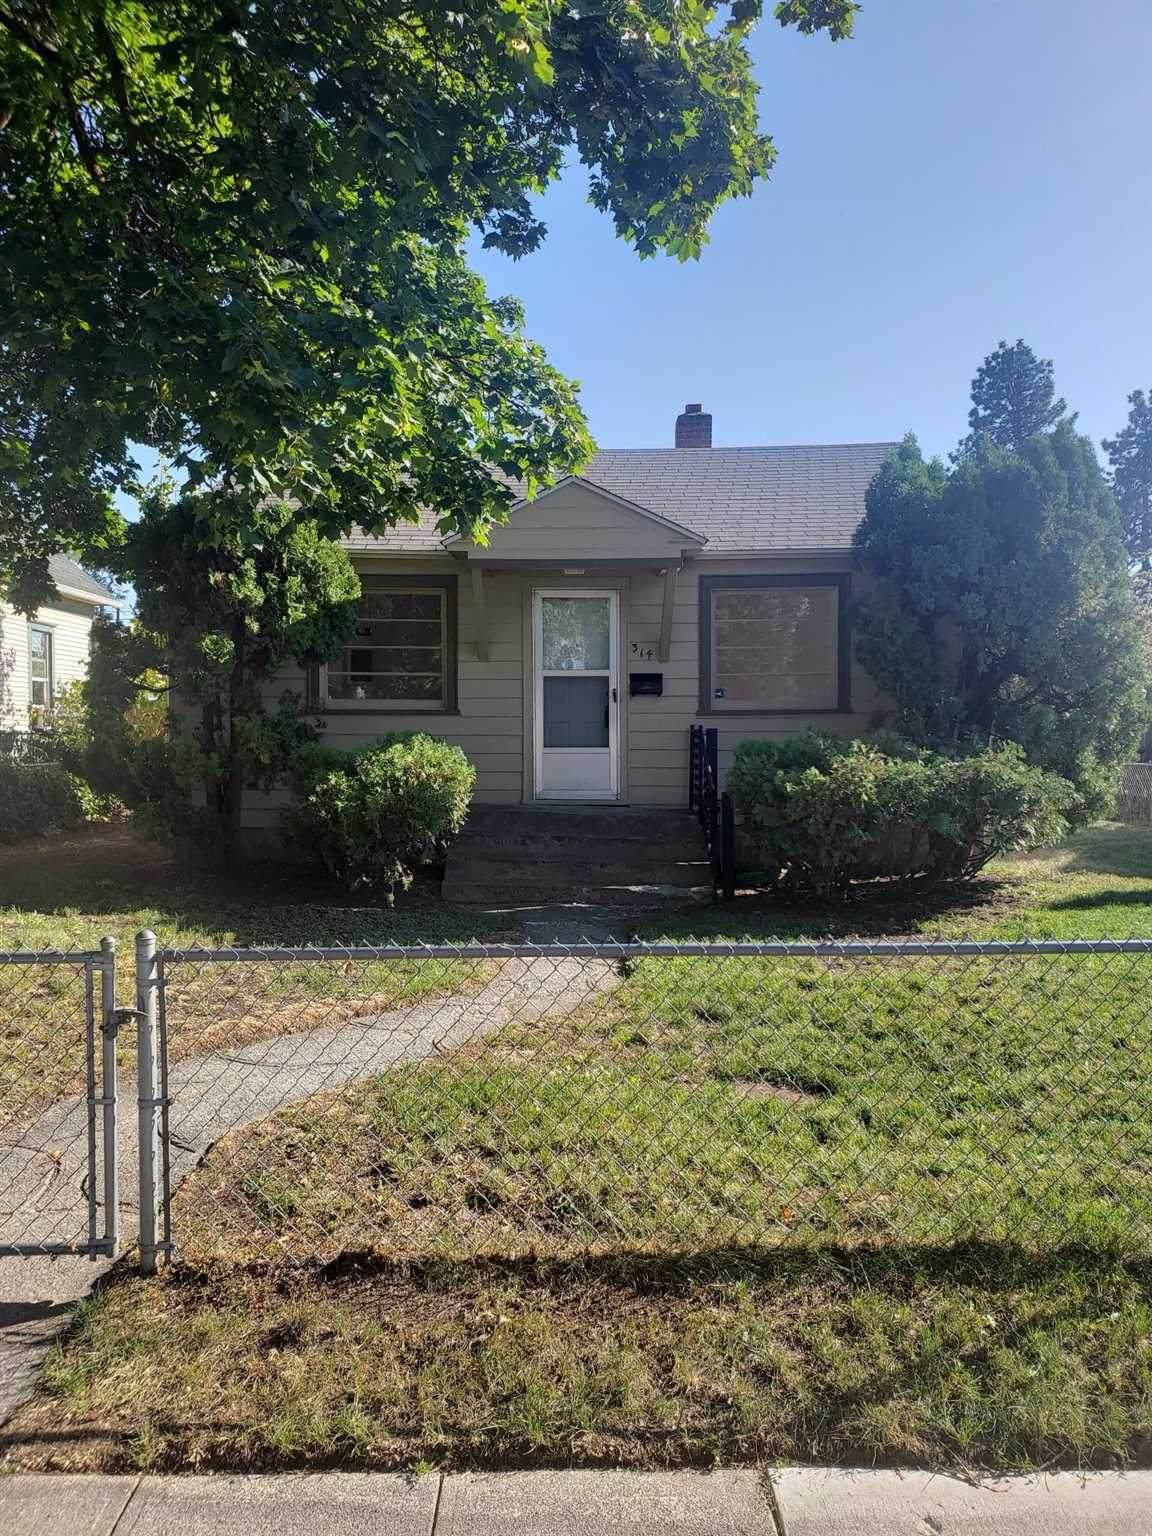 314 Everett Ave - Photo 1